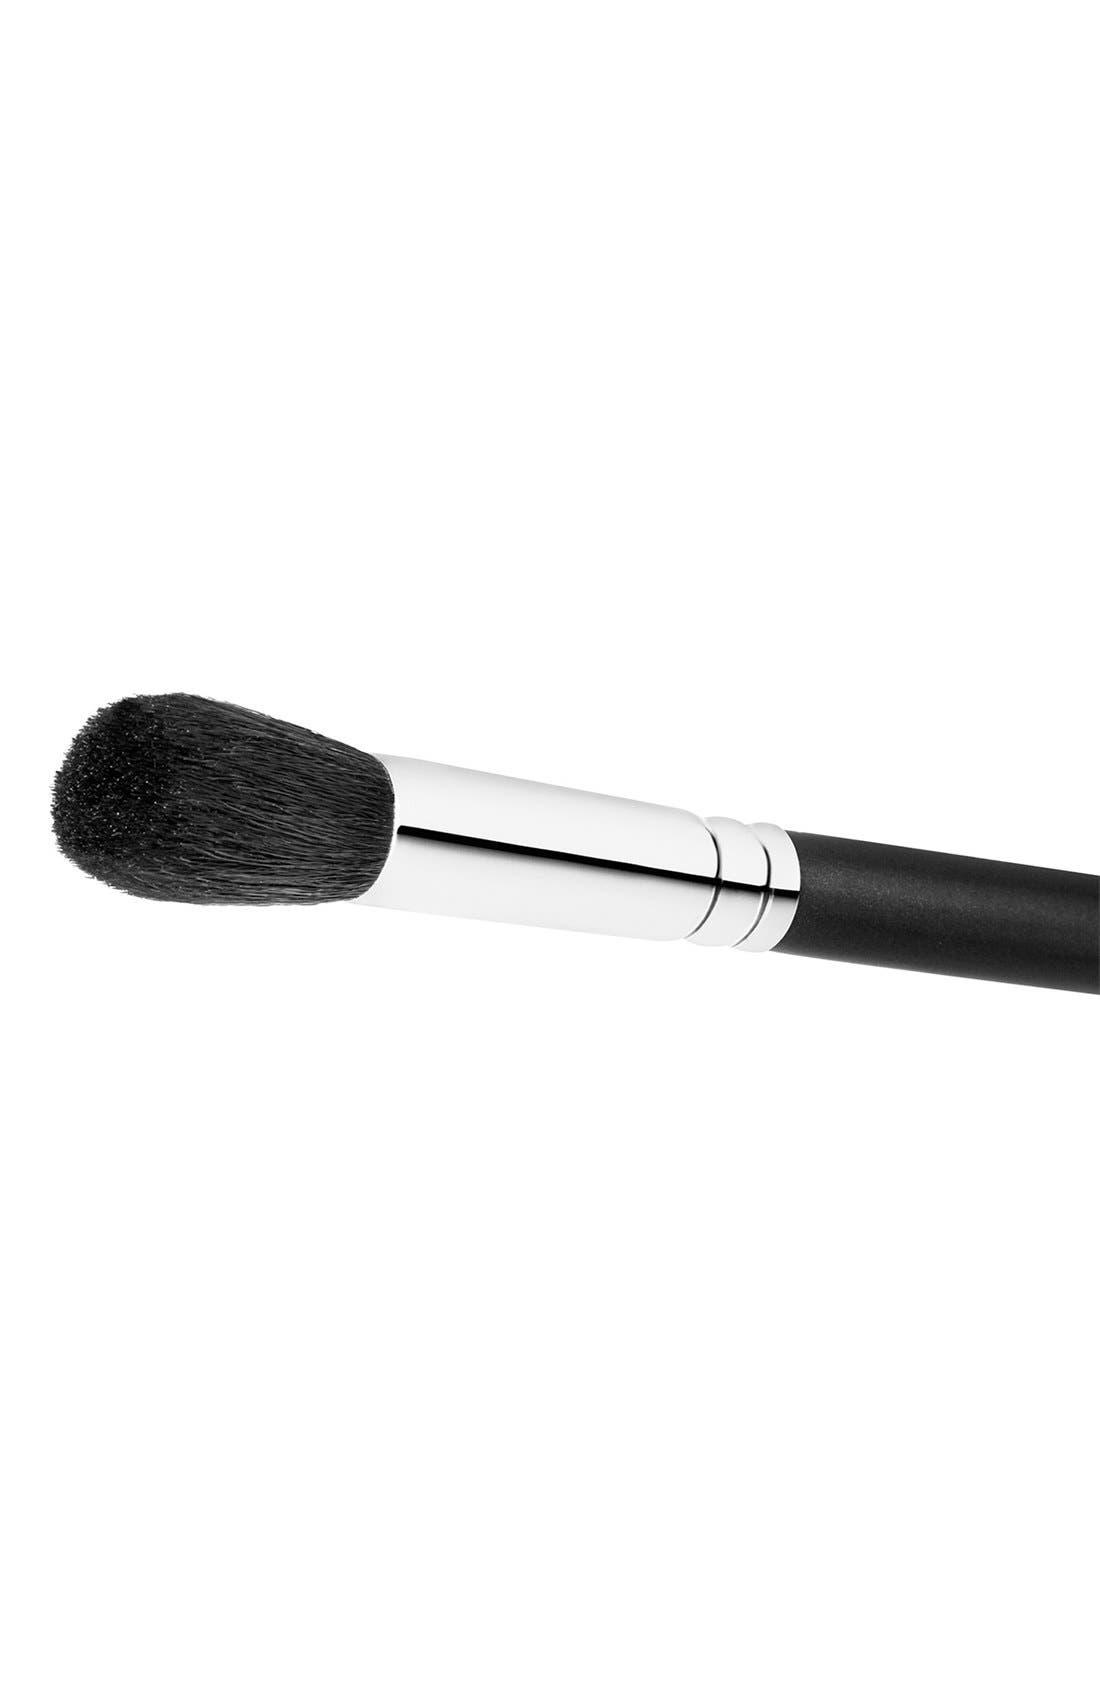 MAC 109 Small Contour Brush,                             Alternate thumbnail 5, color,                             000